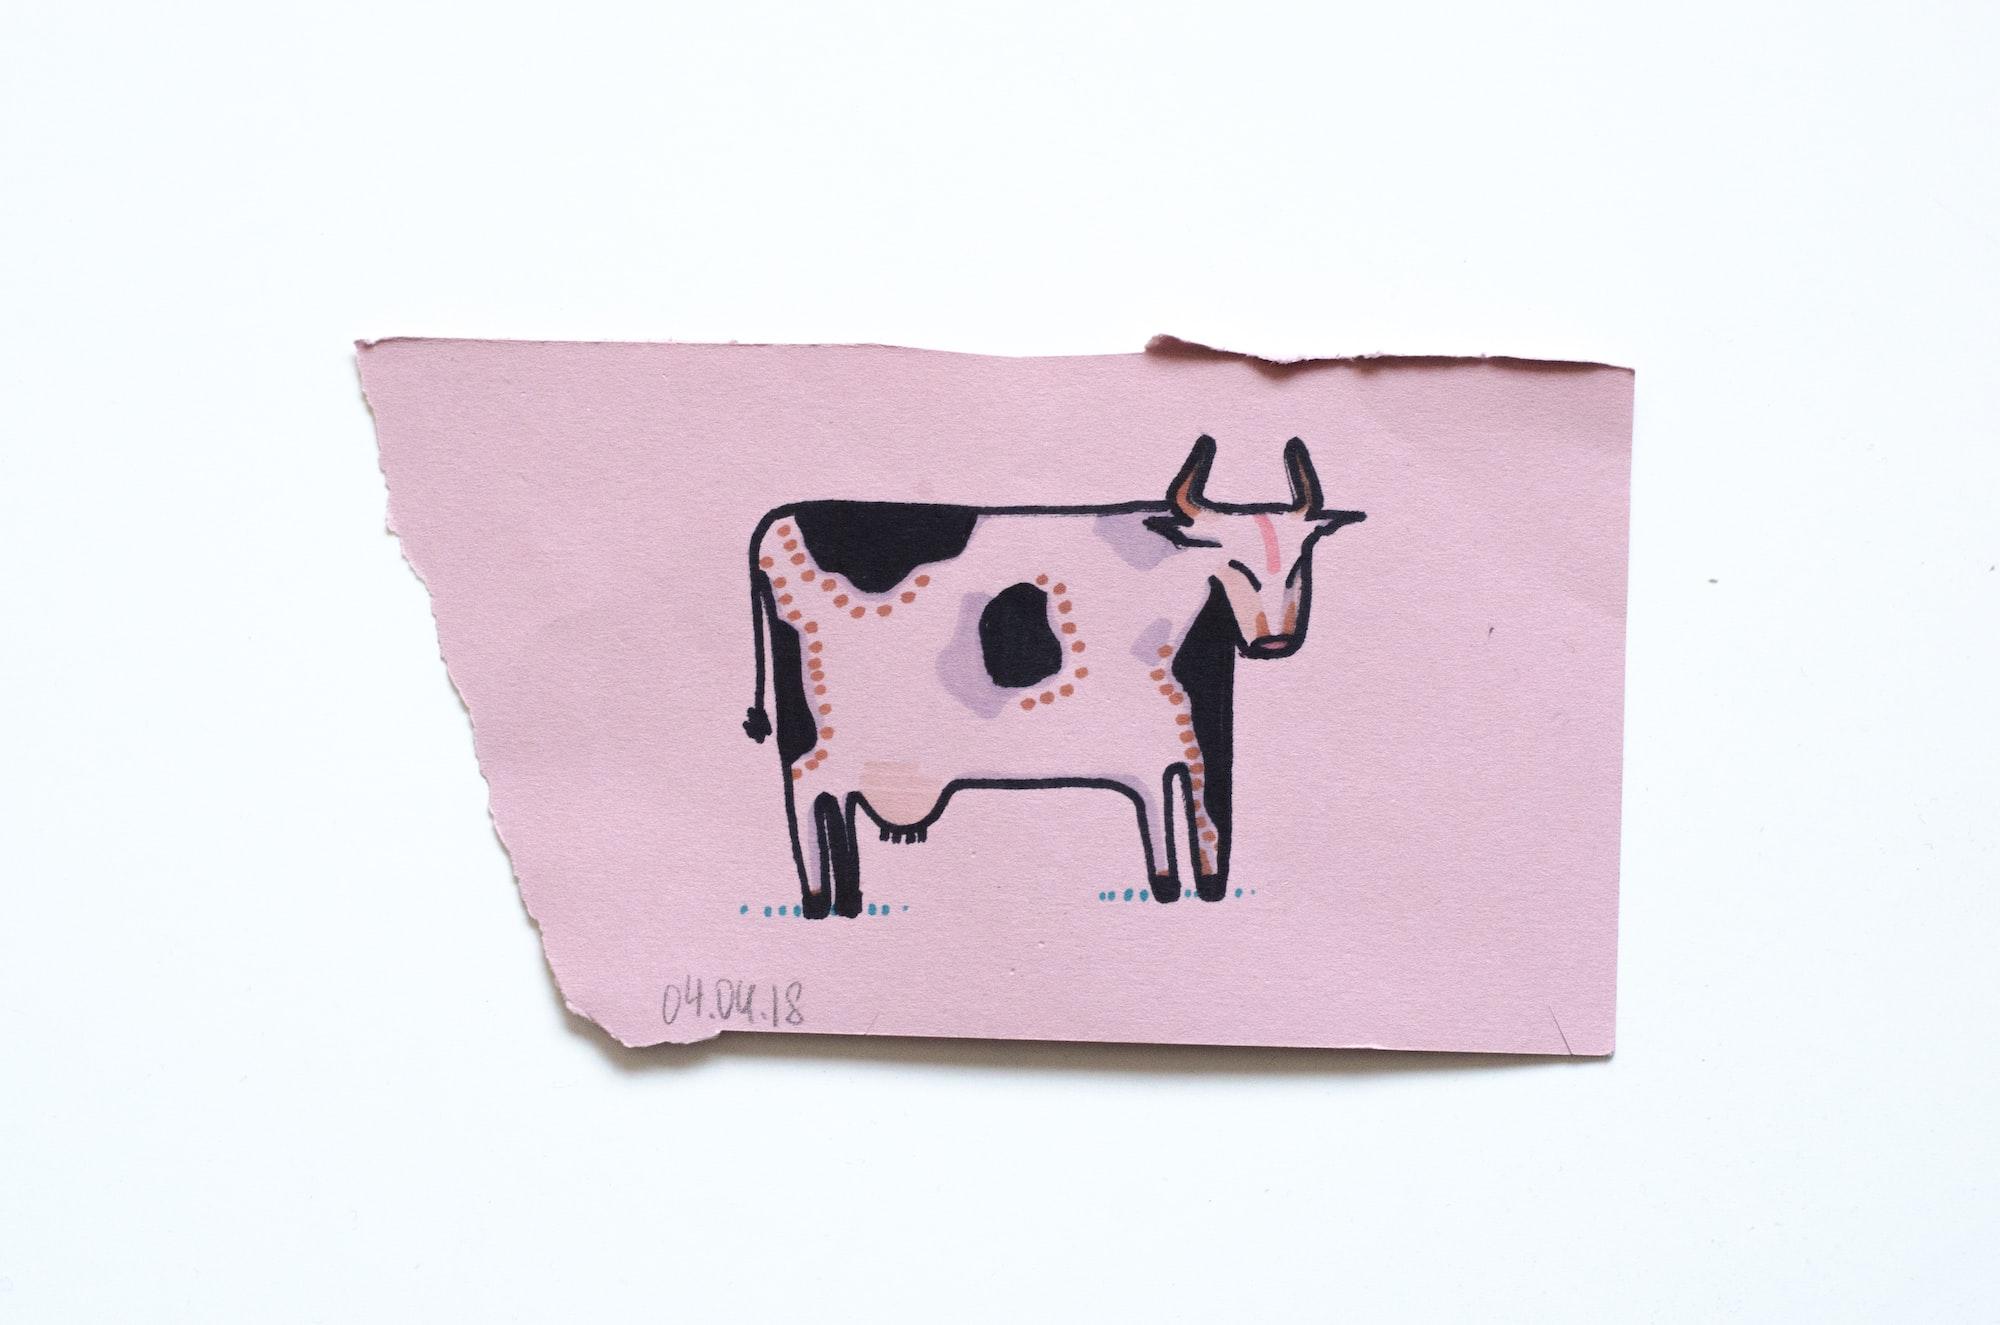 Godin's Purple Cow